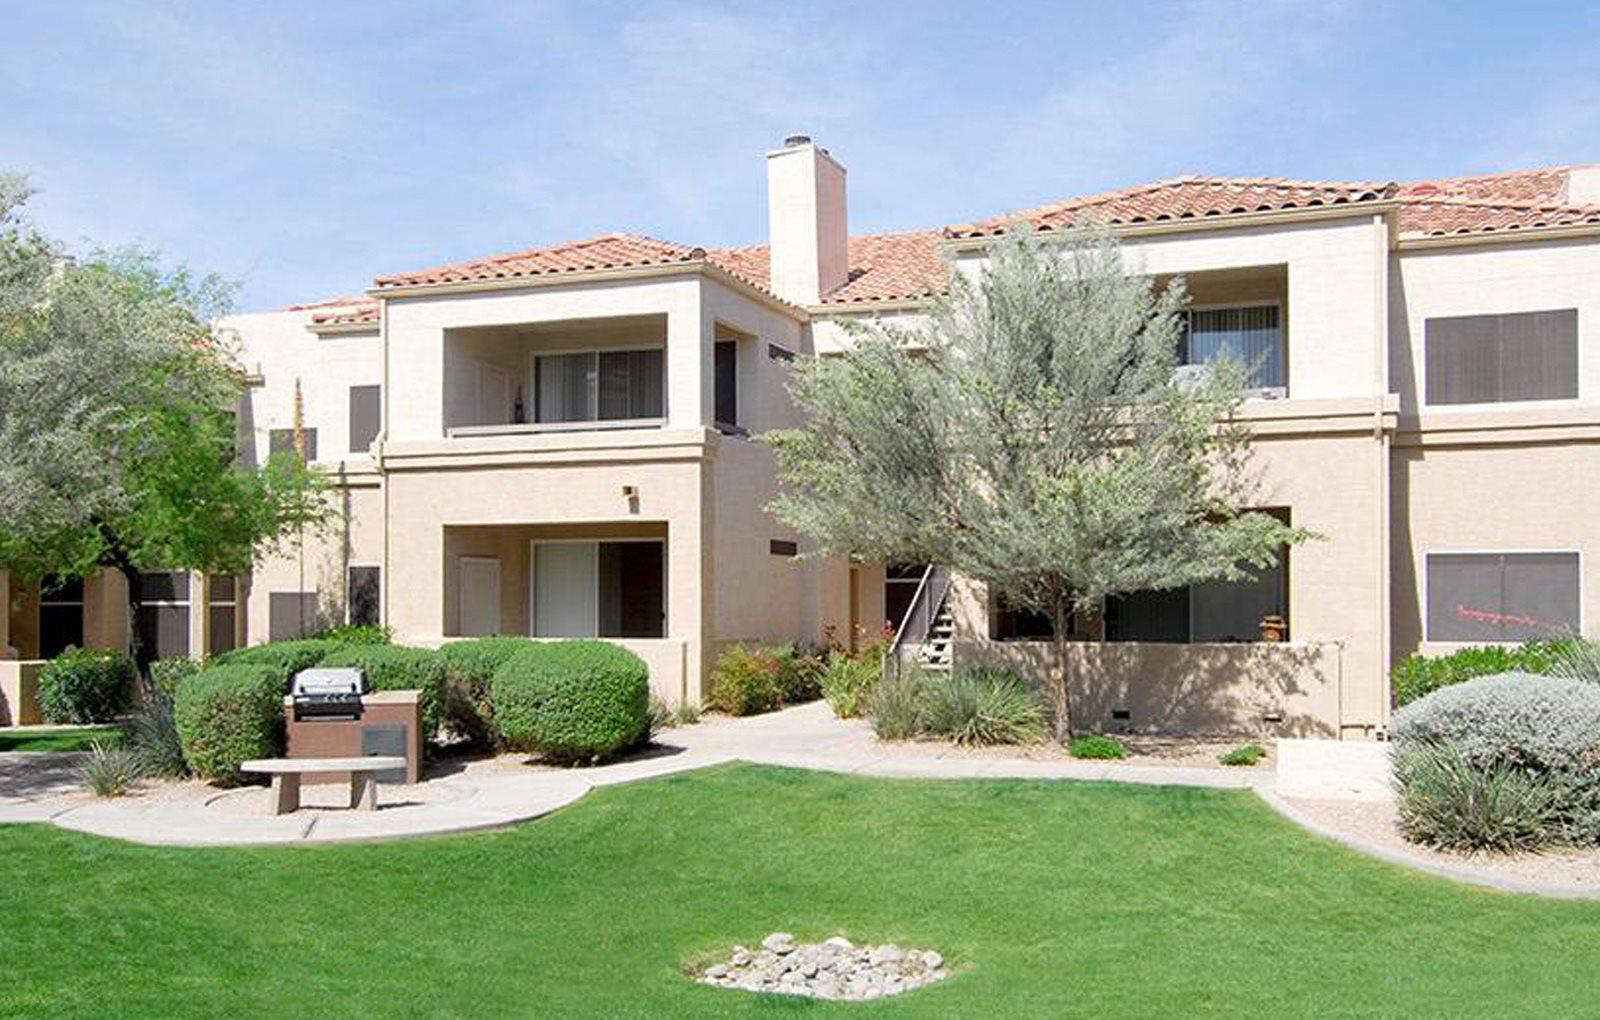 Frank's On Shea   Apartments in Scottsdale, AZ